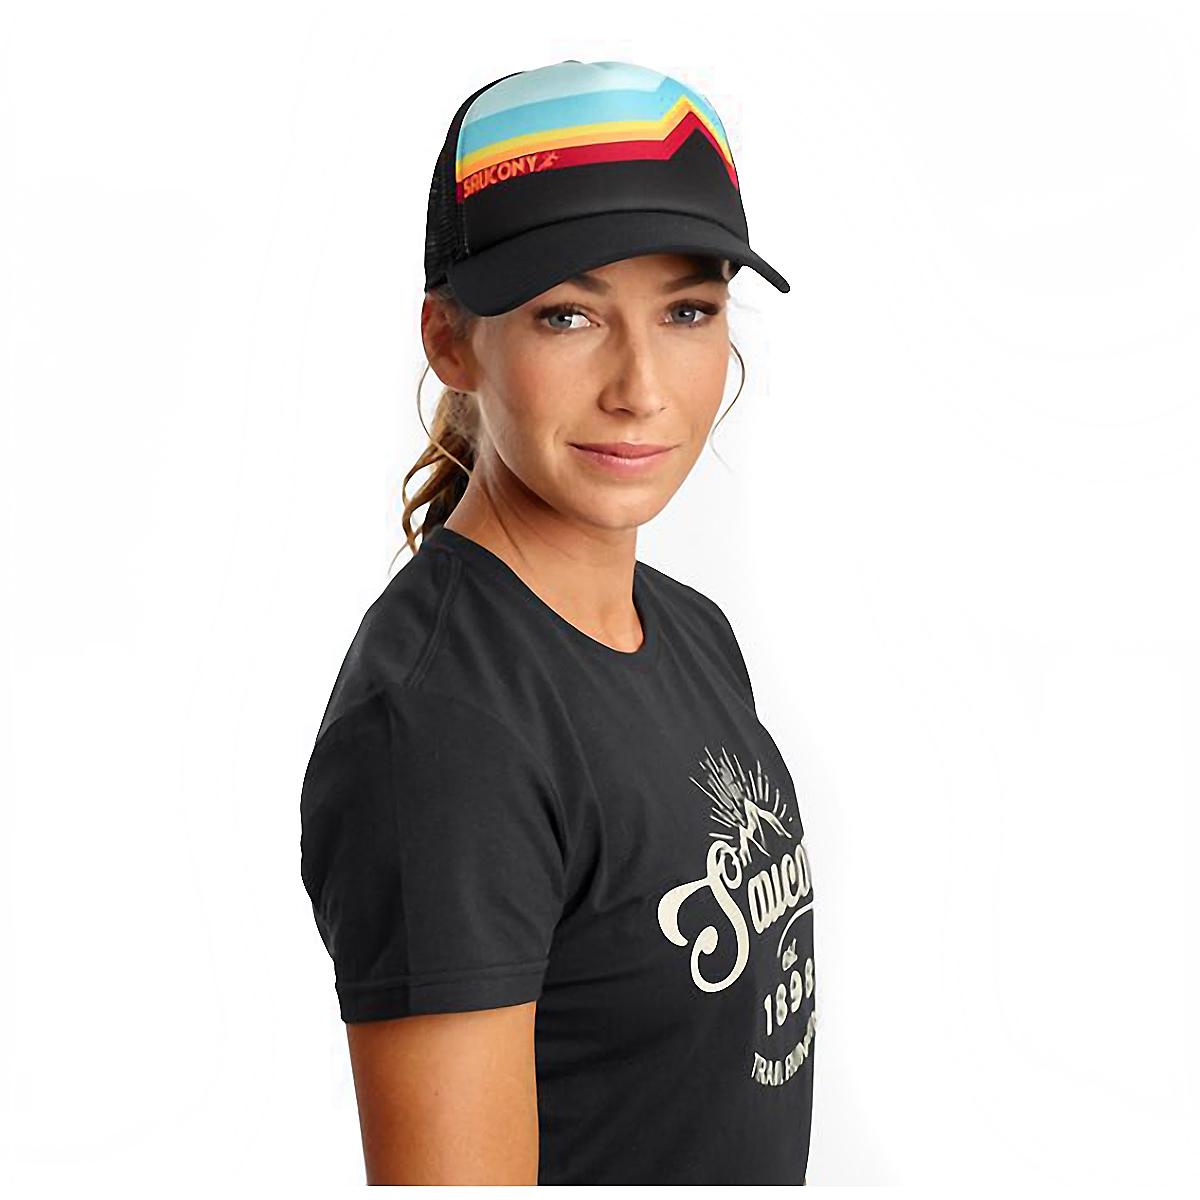 Saucony Foam Trucker Hat - Color: Black, Black, large, image 1